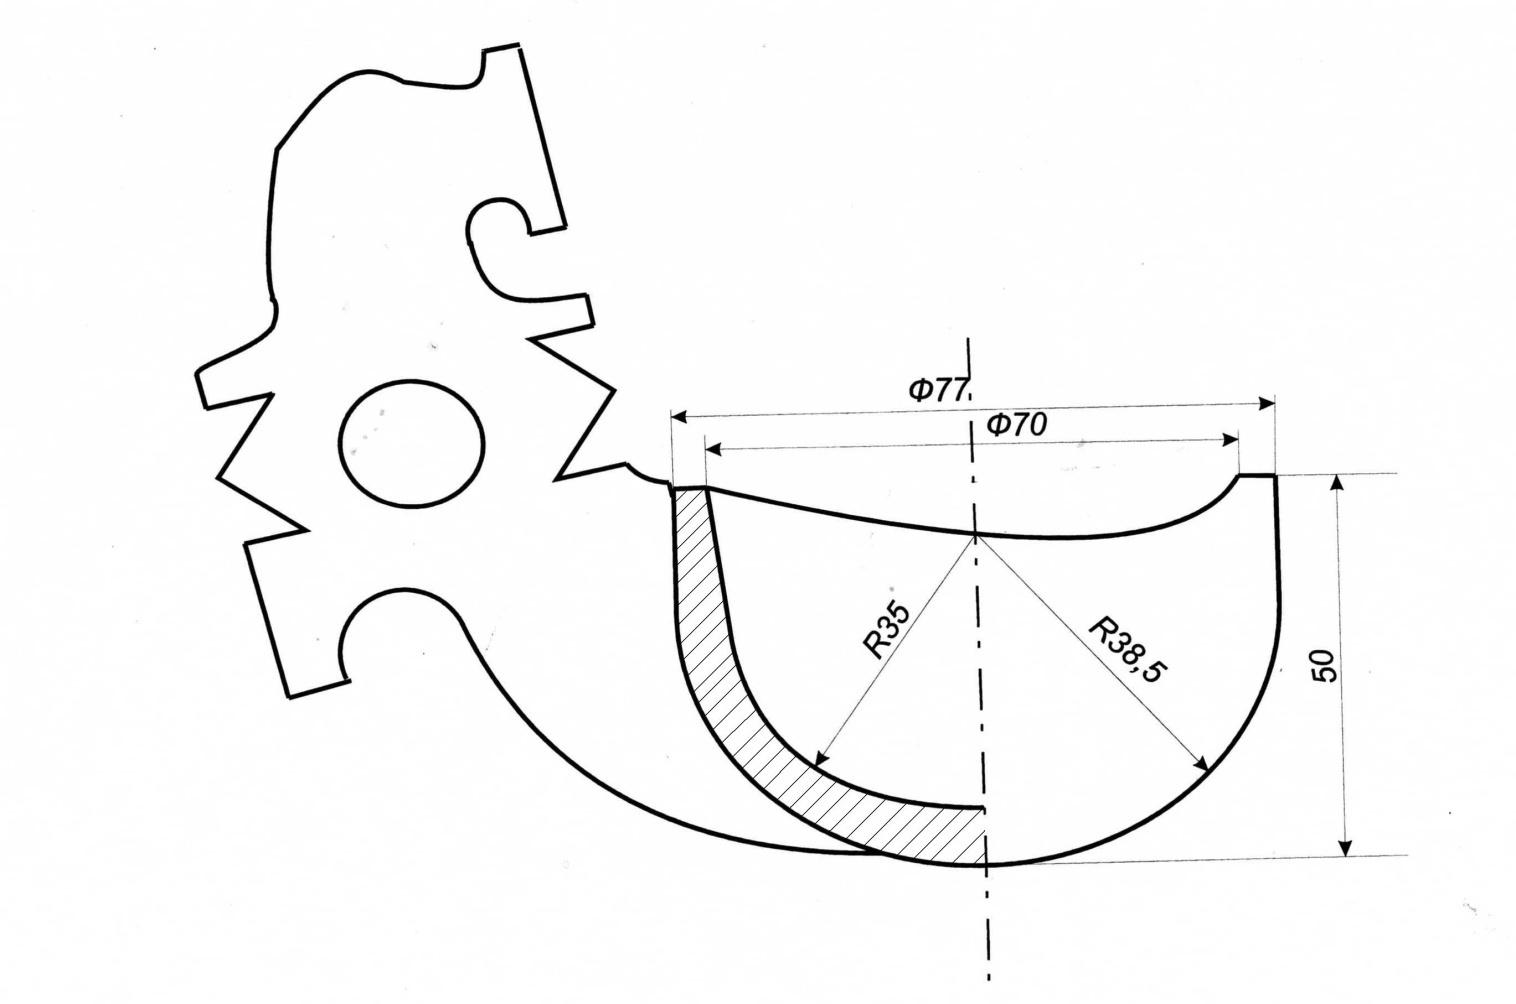 E:\фотки и рисунки\фото\ИЗО\Новая папка\ковши\Копия (2) img560.jpg